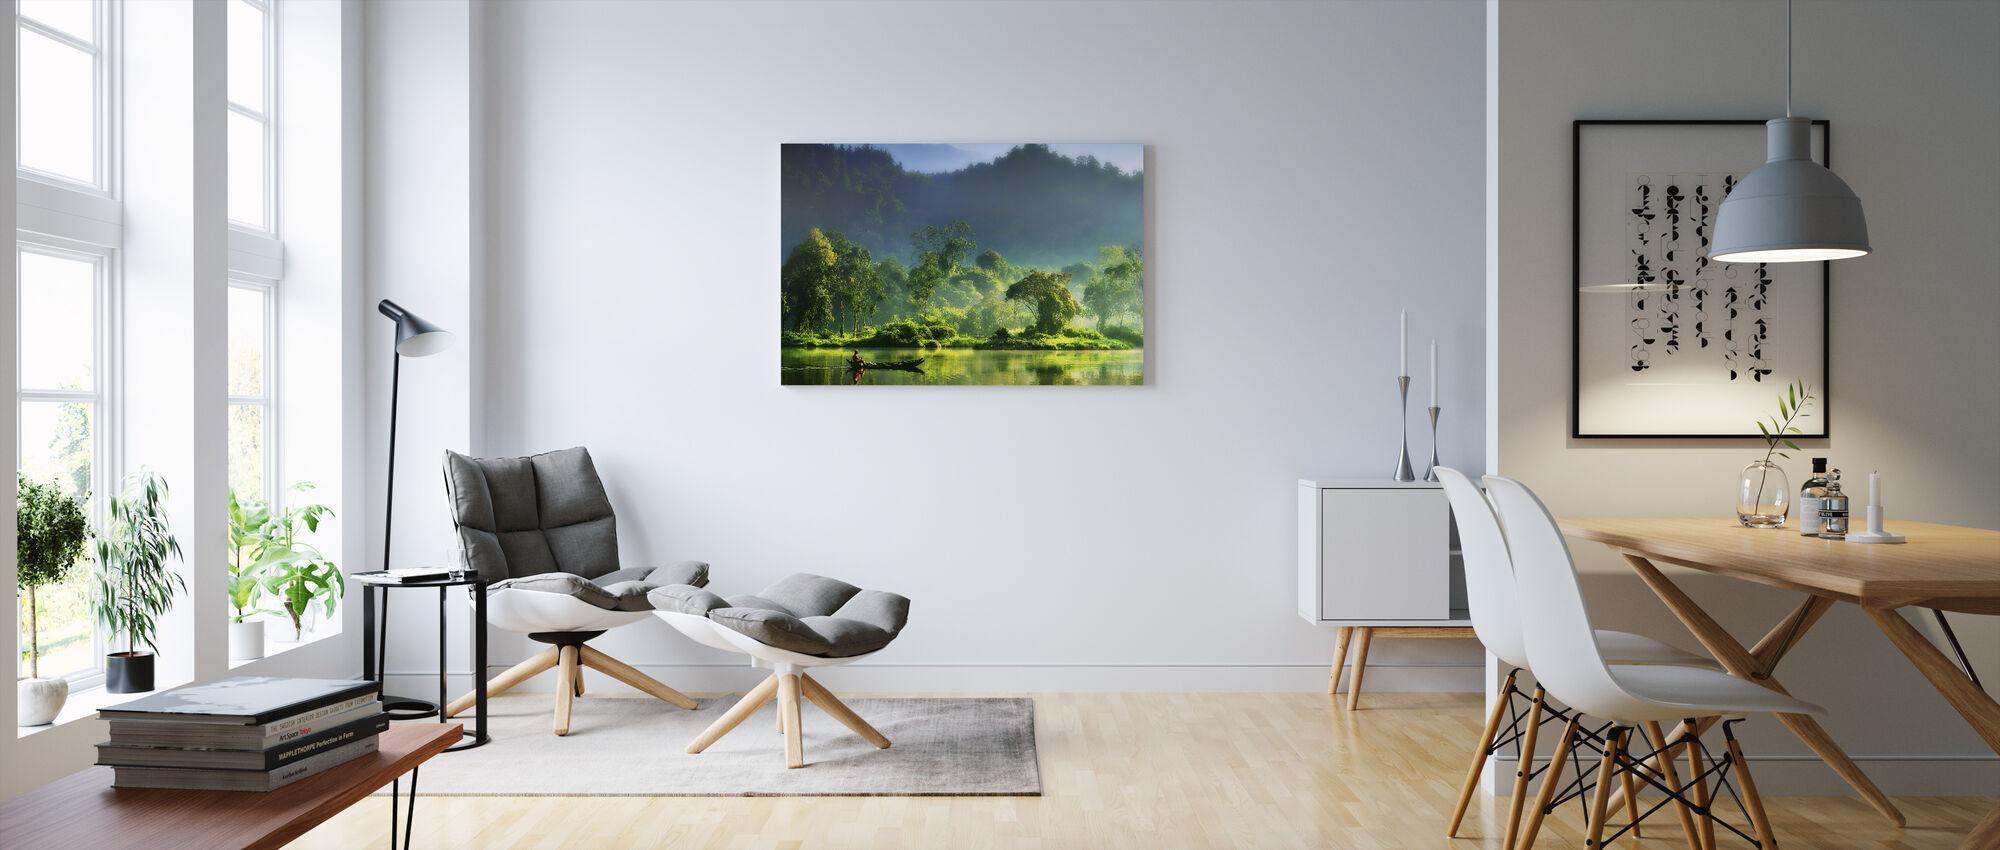 Målning av naturen - Canvastavla - Vardagsrum